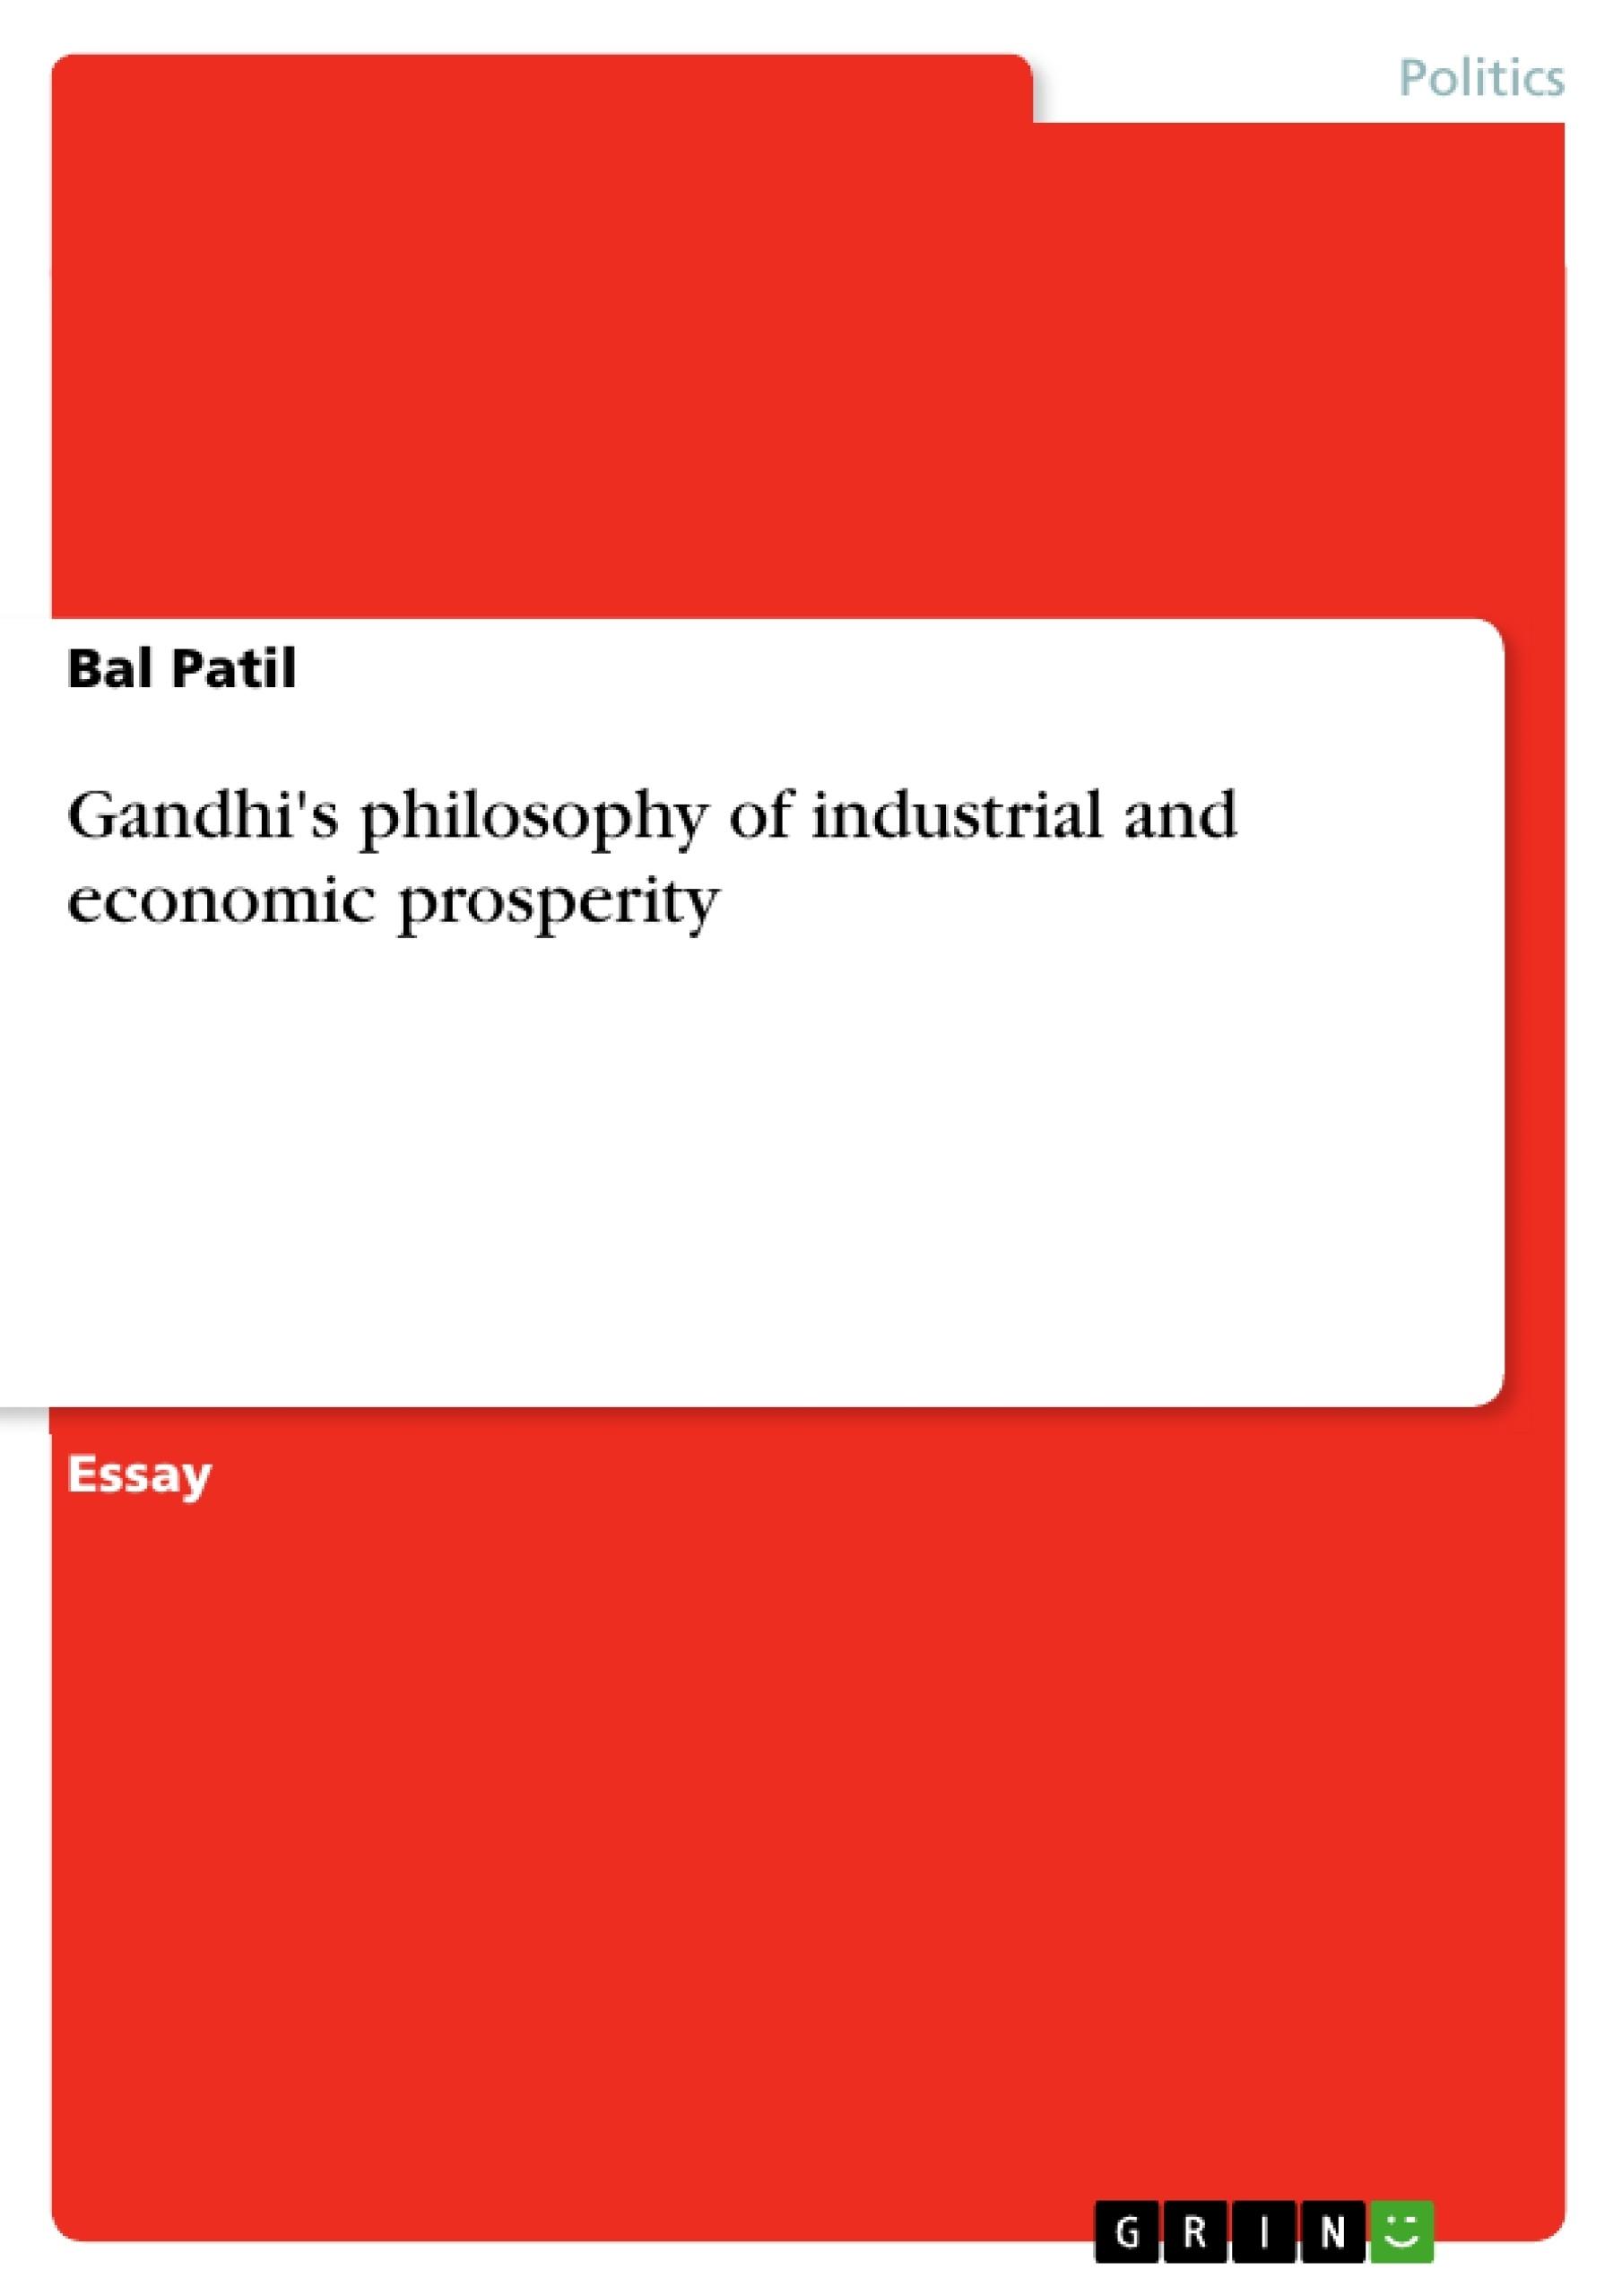 Title: Gandhi's philosophy of industrial and economic prosperity